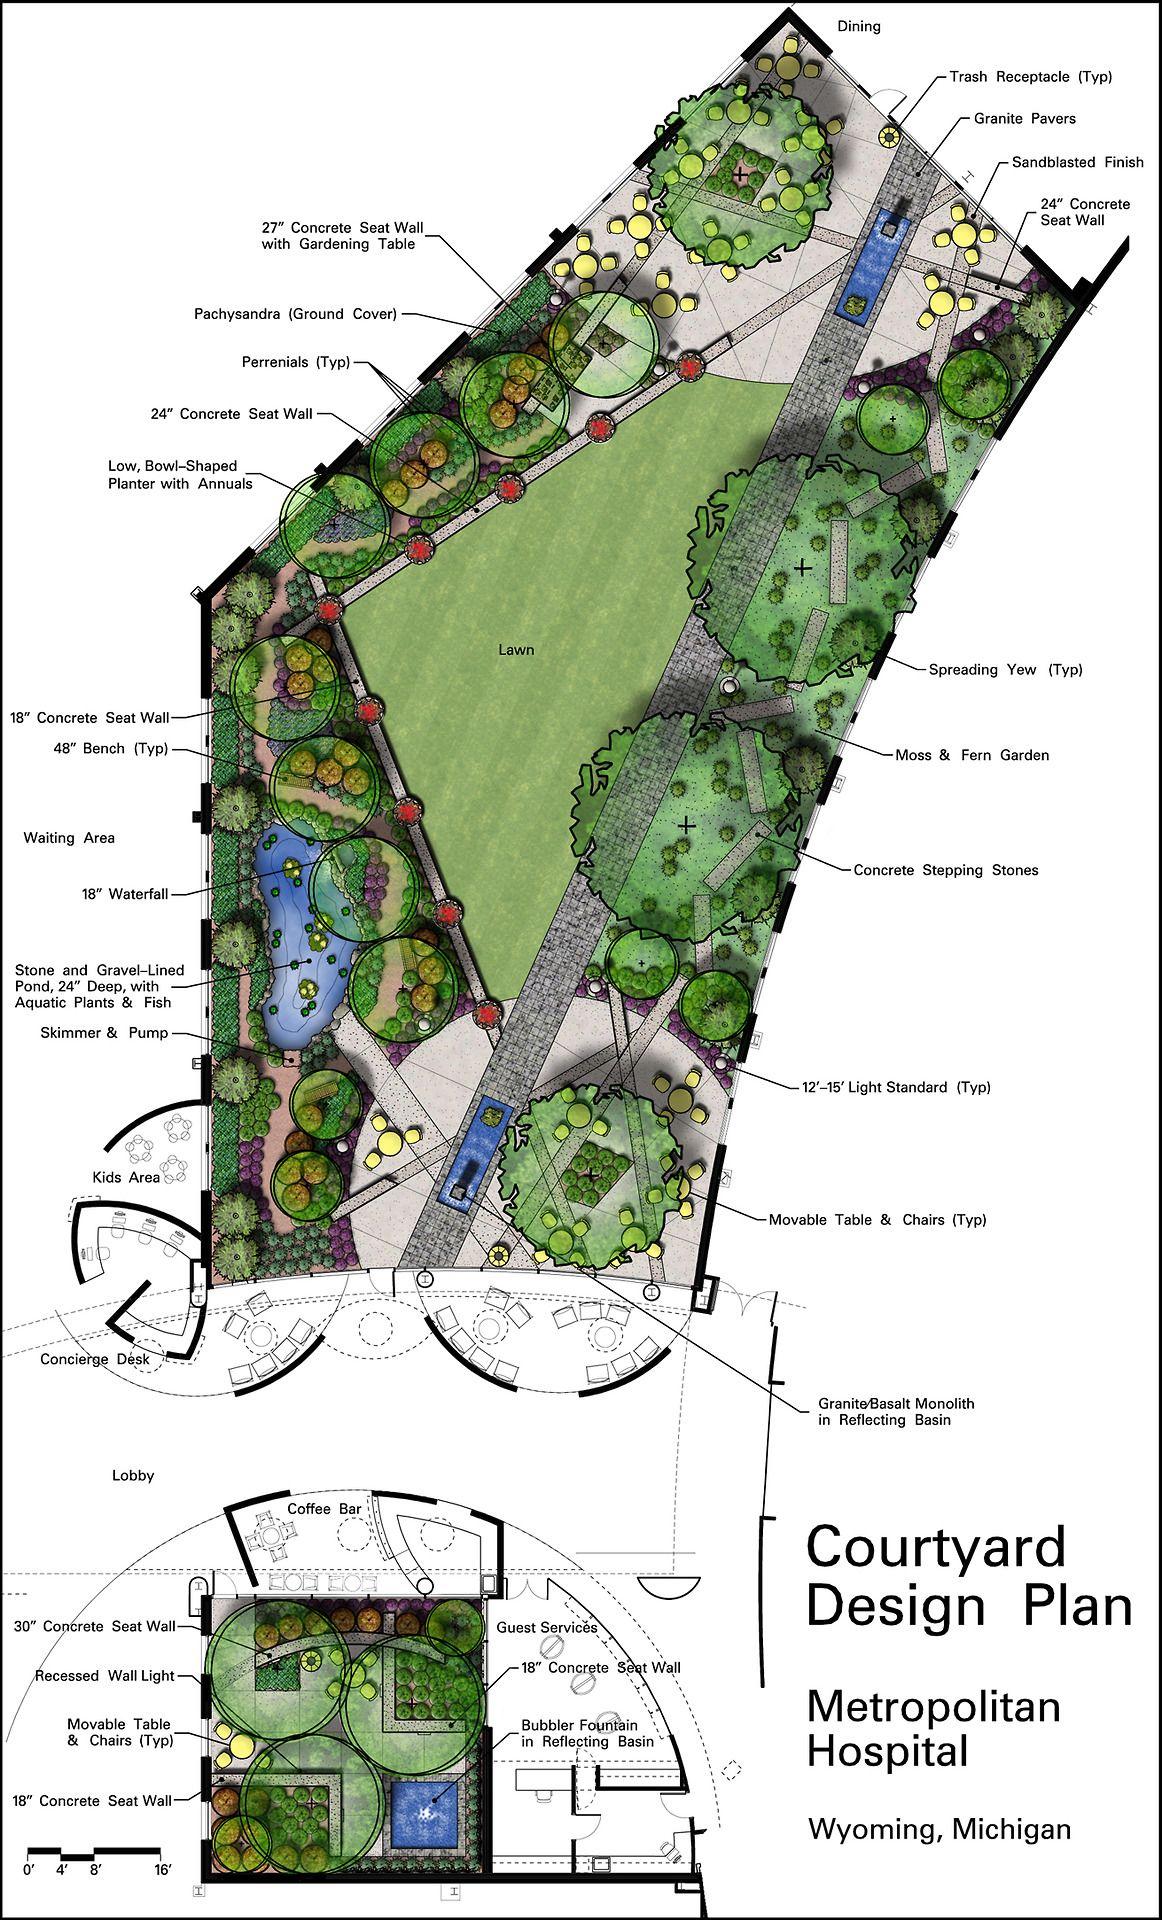 Pin By Ada Bingol On Landscape Architecture Courtyard Design Landscape Design Landscape Design Plans